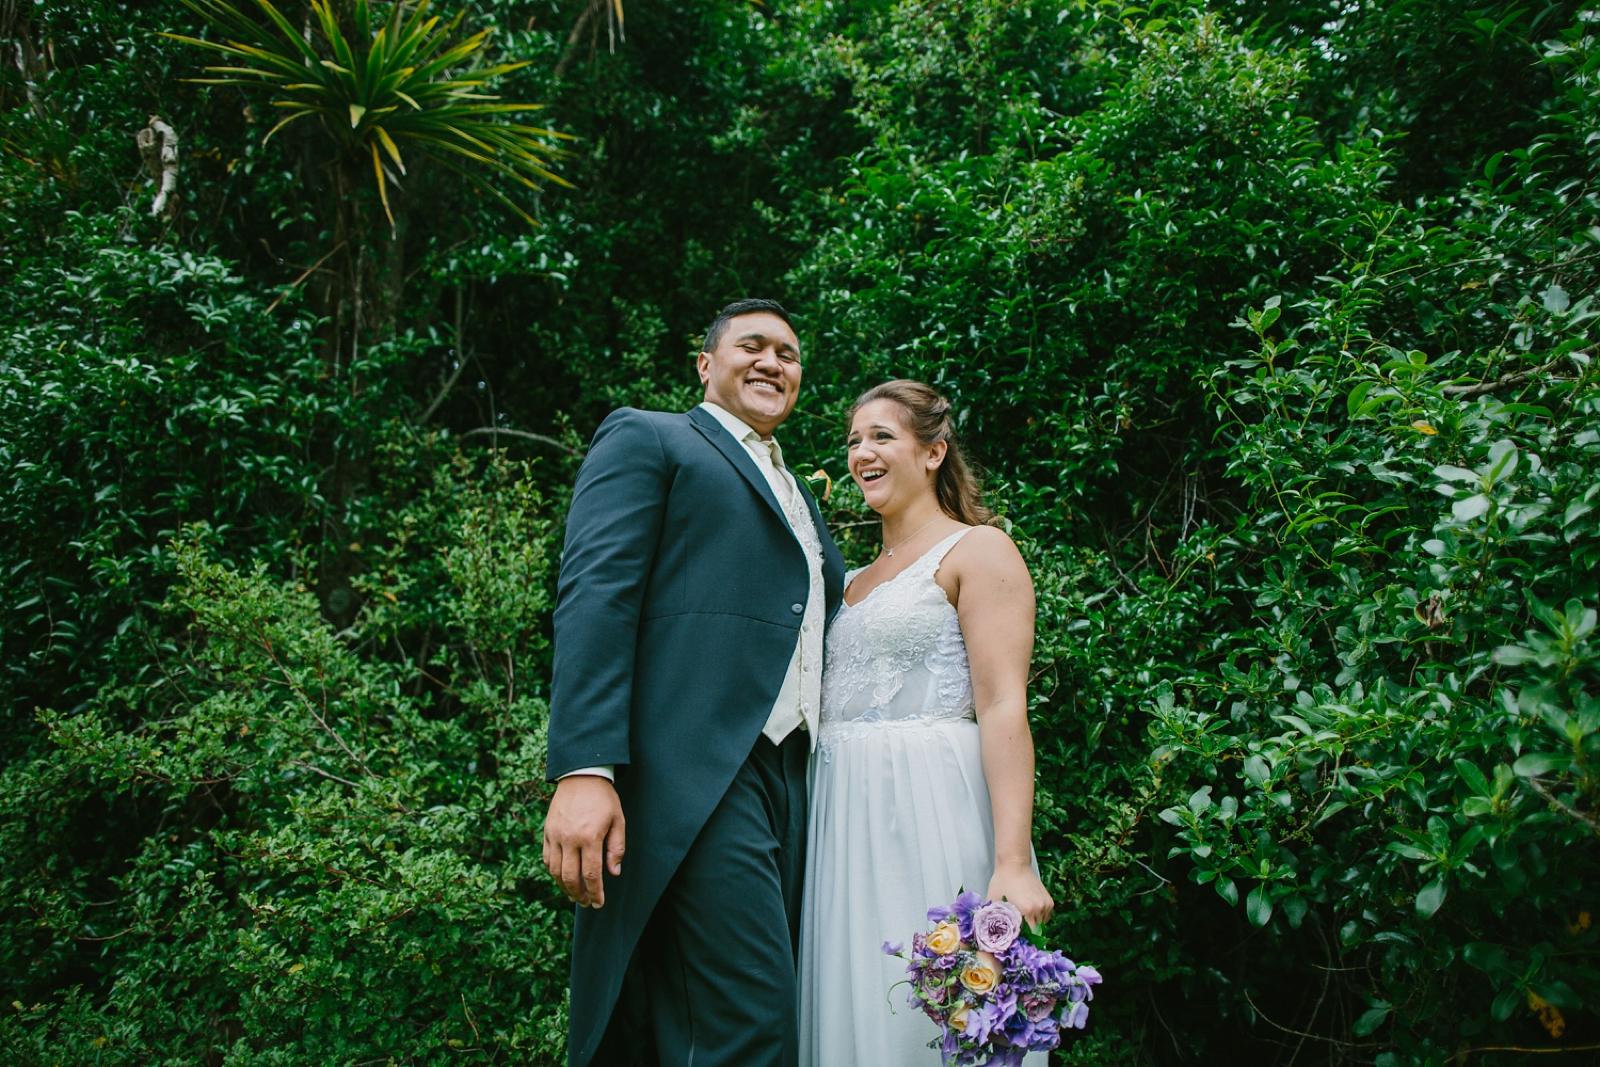 GabbyFiti_Auckland Wedding Photographer_Patty Lagera_0072.jpg